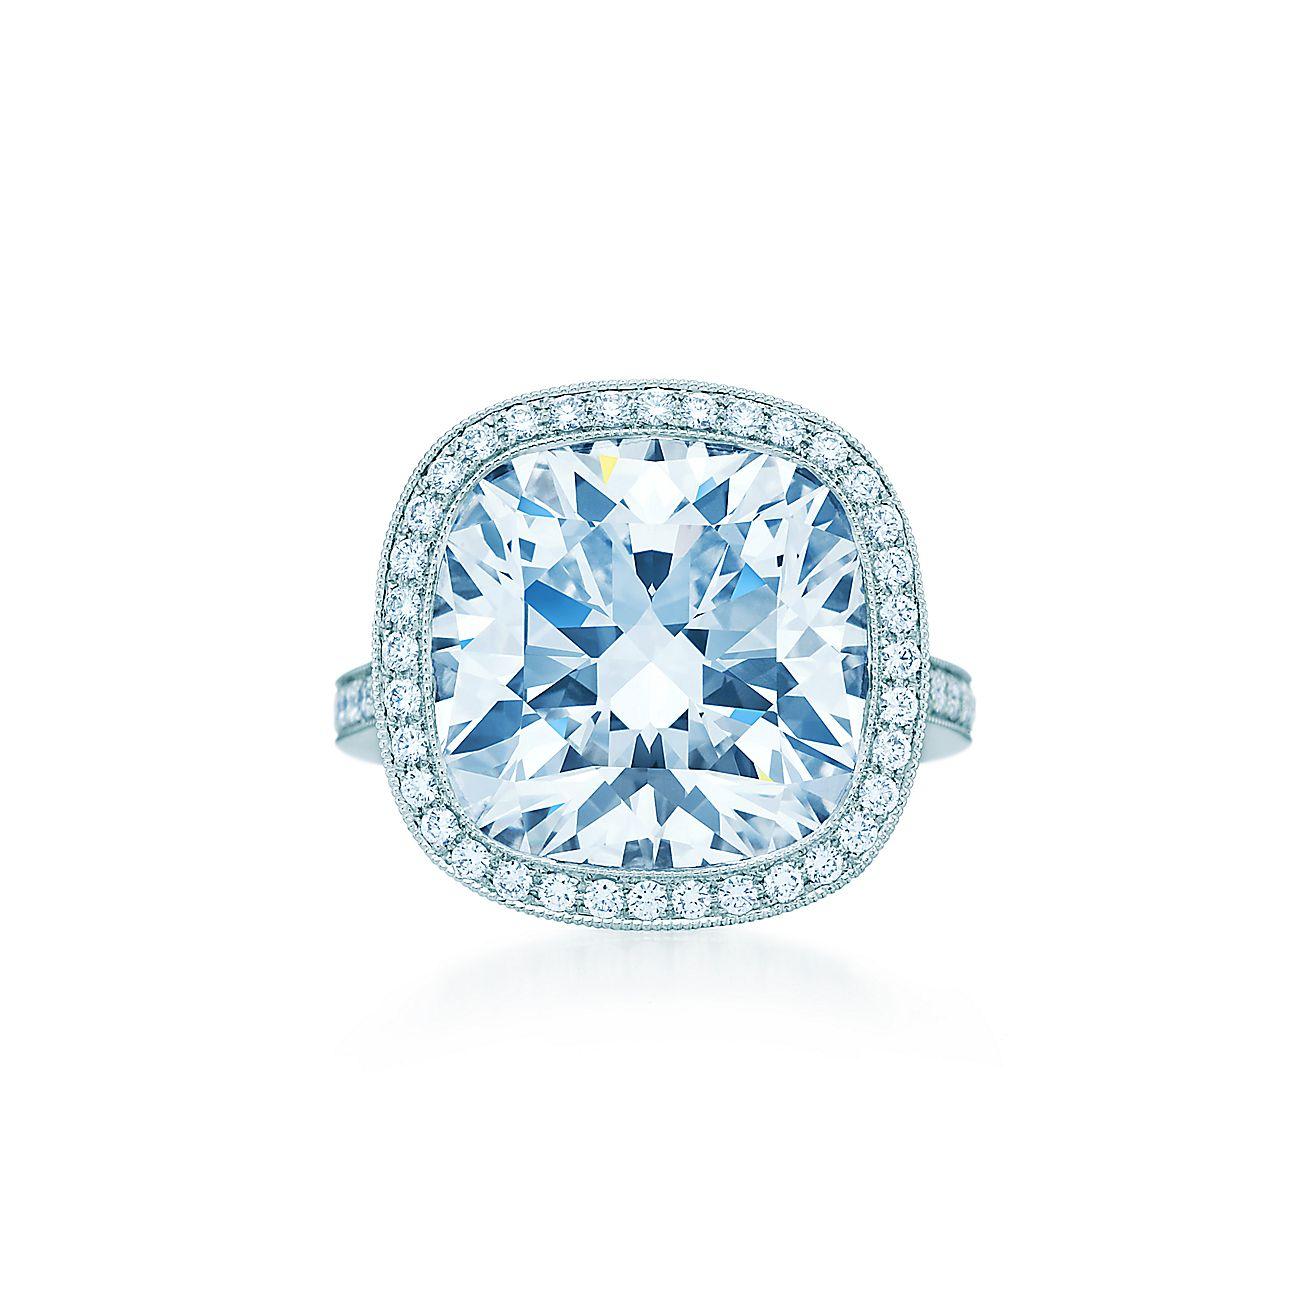 Cushioncut Diamond Ring In Platinum With Round Brilliant Diamonds   Tiffany & Co